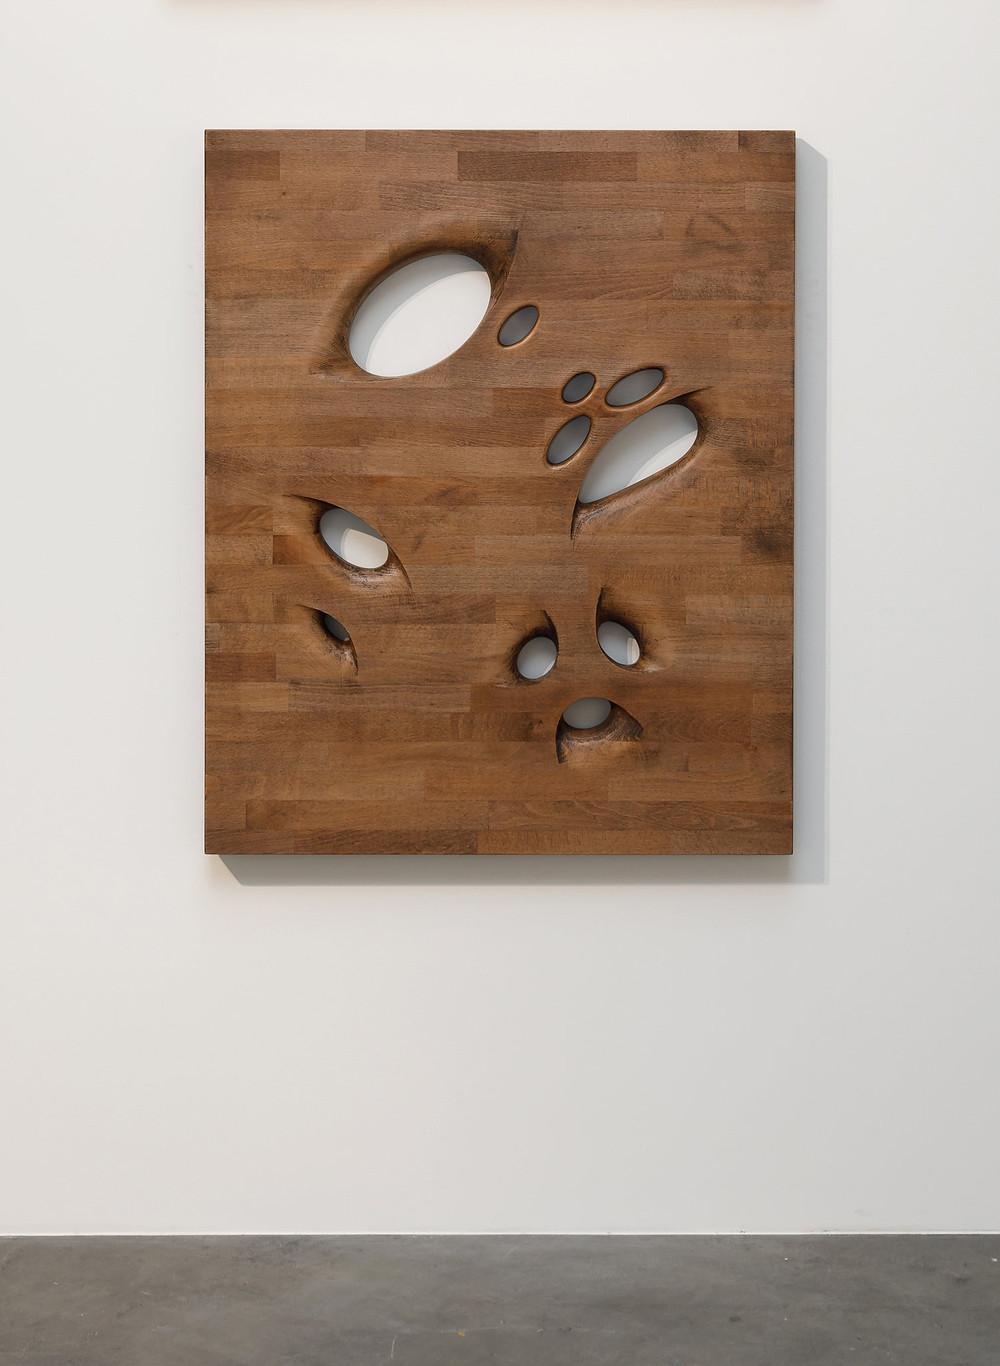 Richard Nikl, Assistant, 2017, Beech Wood, Hard Wax Oil, Aluminium Hardware, 100 x 82 x 5 cm